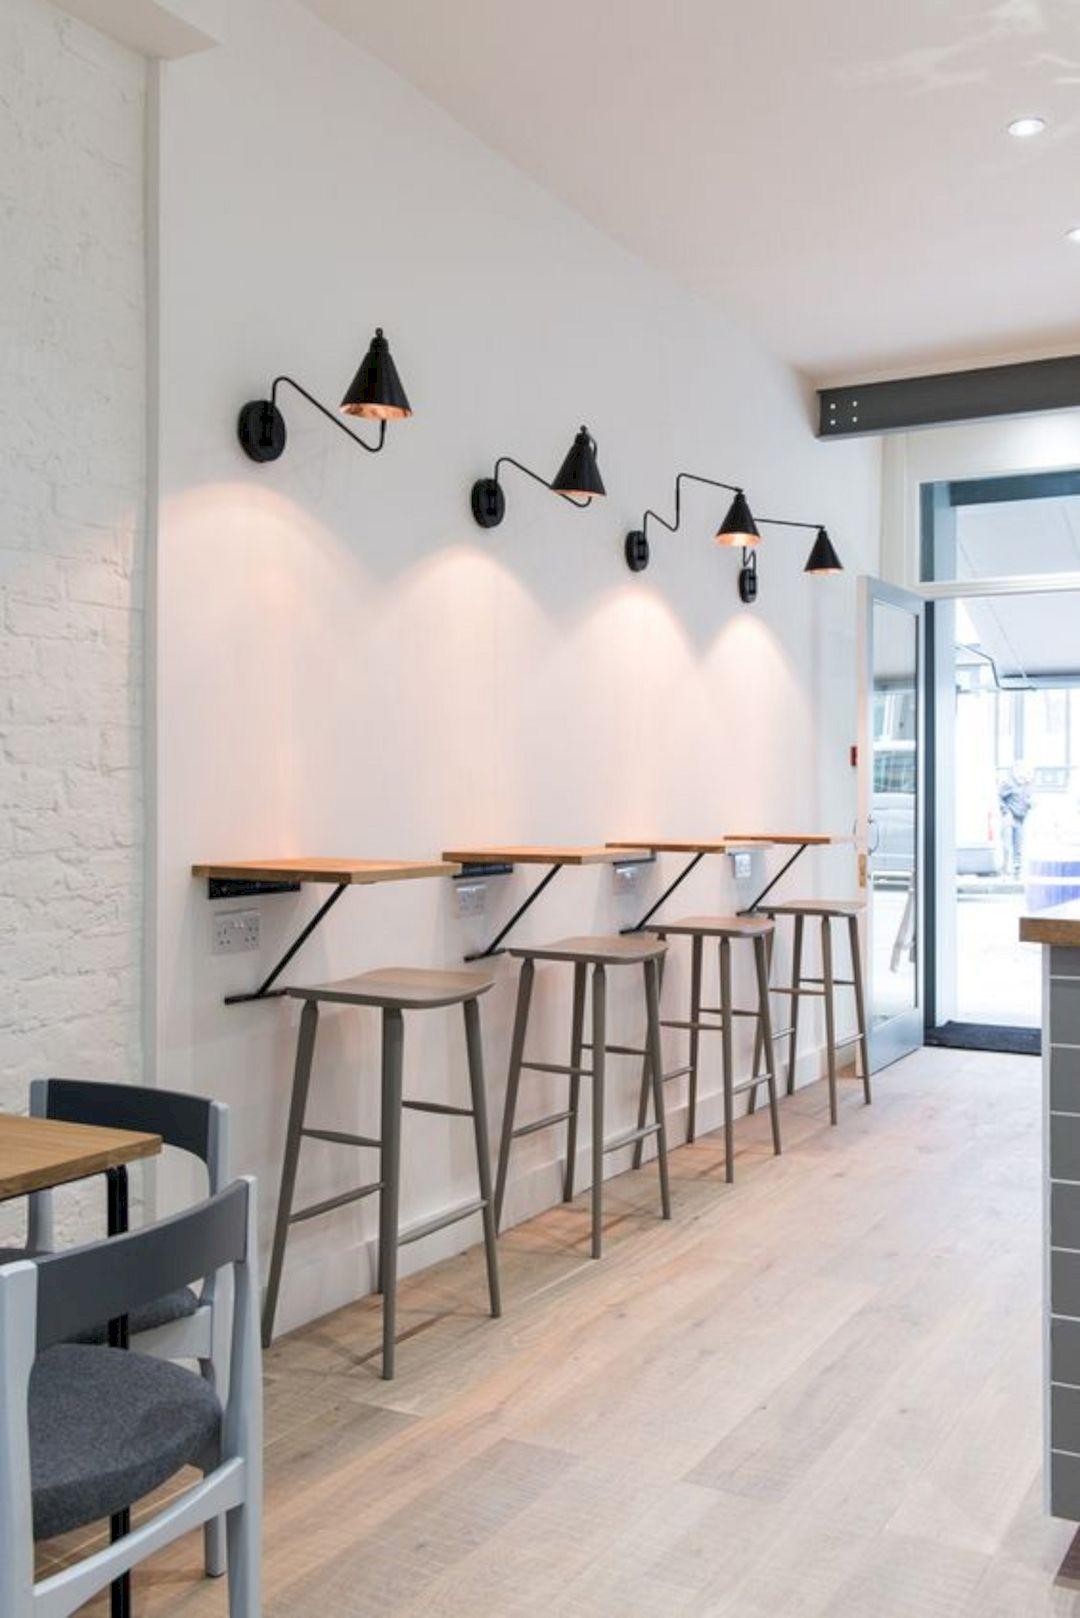 15 Café Shop Interior Design Ideas To Lure Customers  Https://www.futuristarchitecture